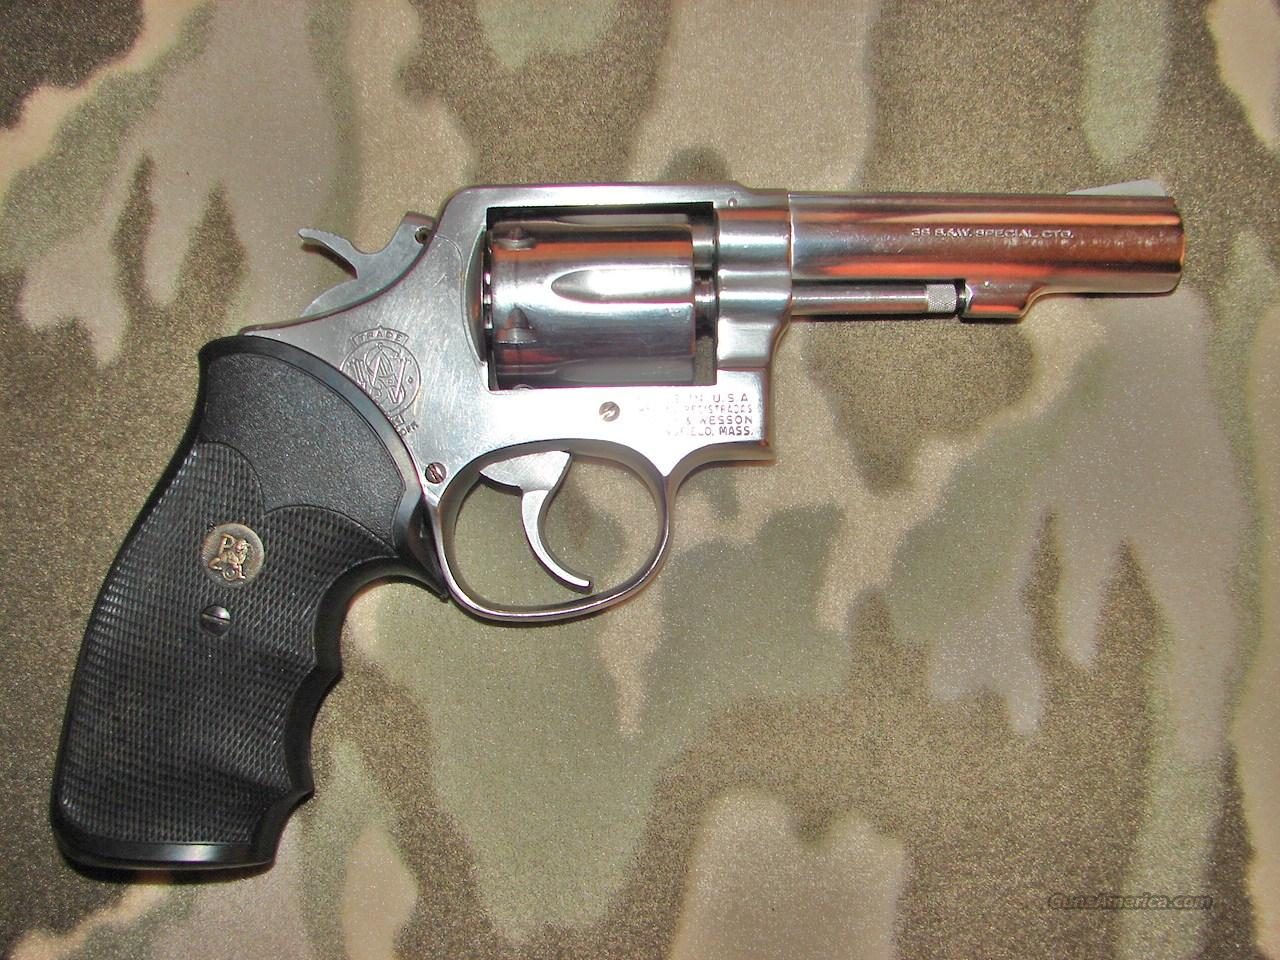 Smith & Wesson 64-3  Guns > Pistols > Smith & Wesson Revolvers > Full Frame Revolver